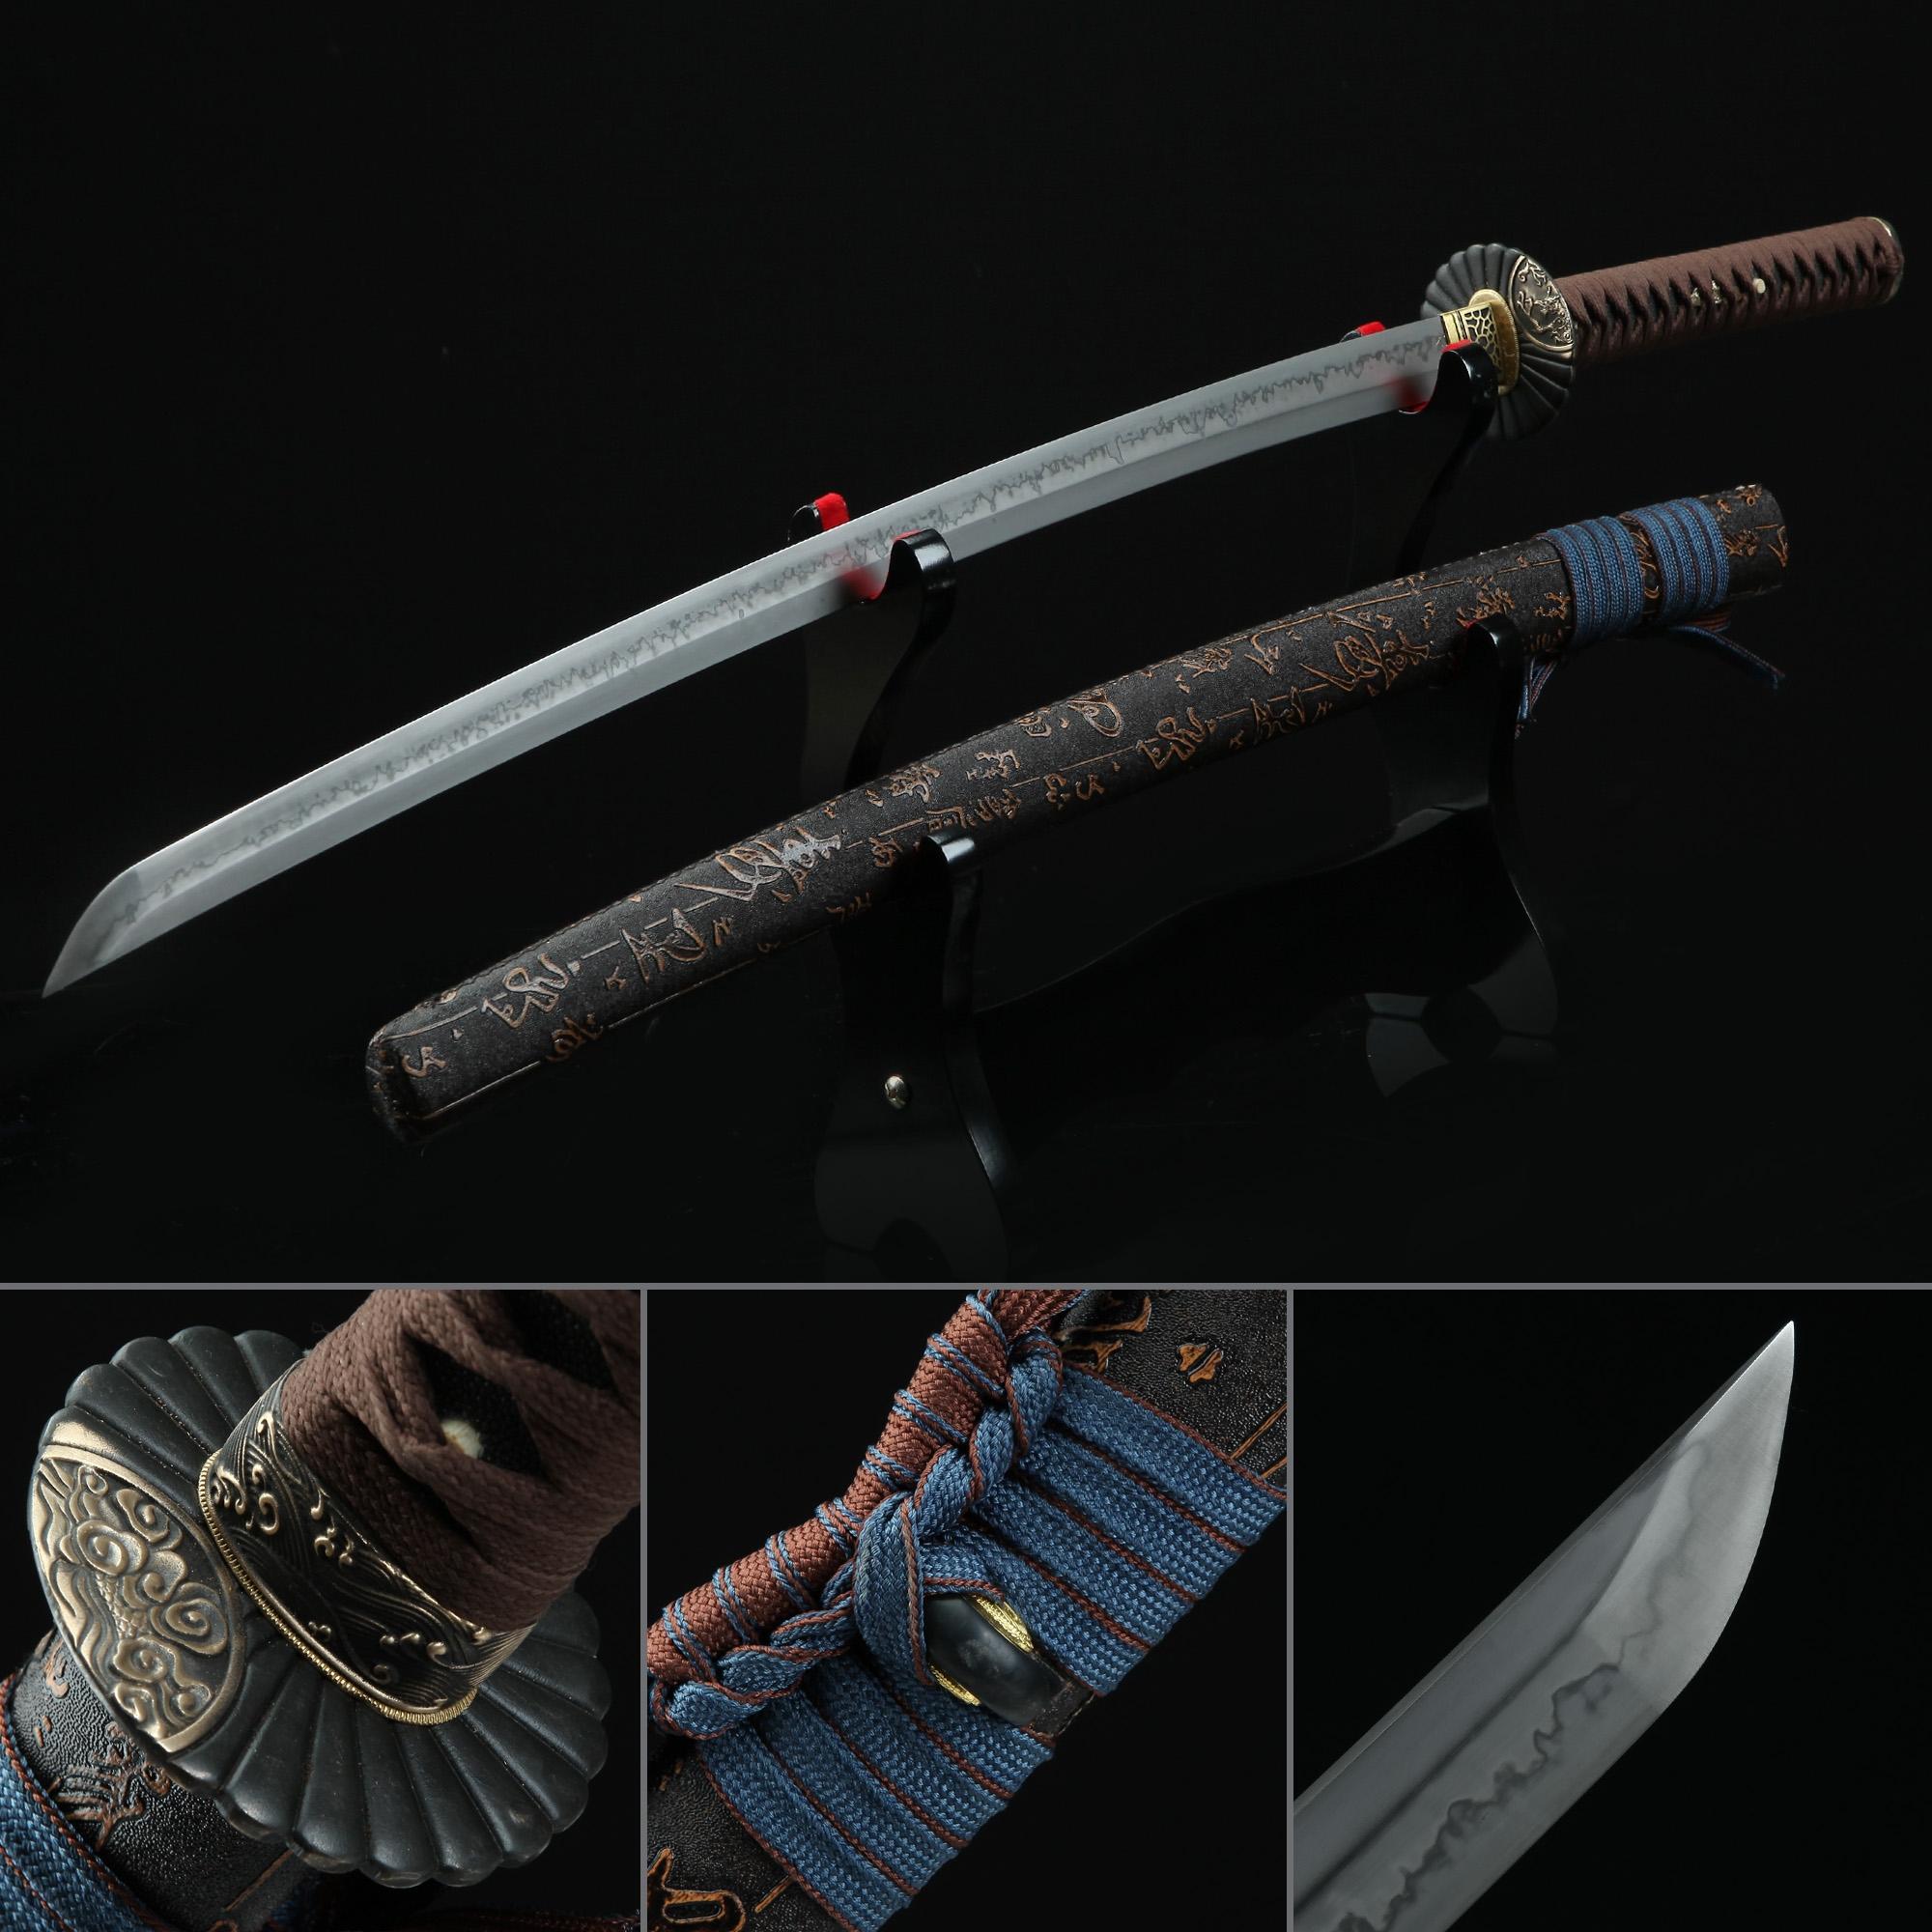 Real Hamon Sunflower Tsuba Katana Samurai Swords With Chinese Character Scabbard